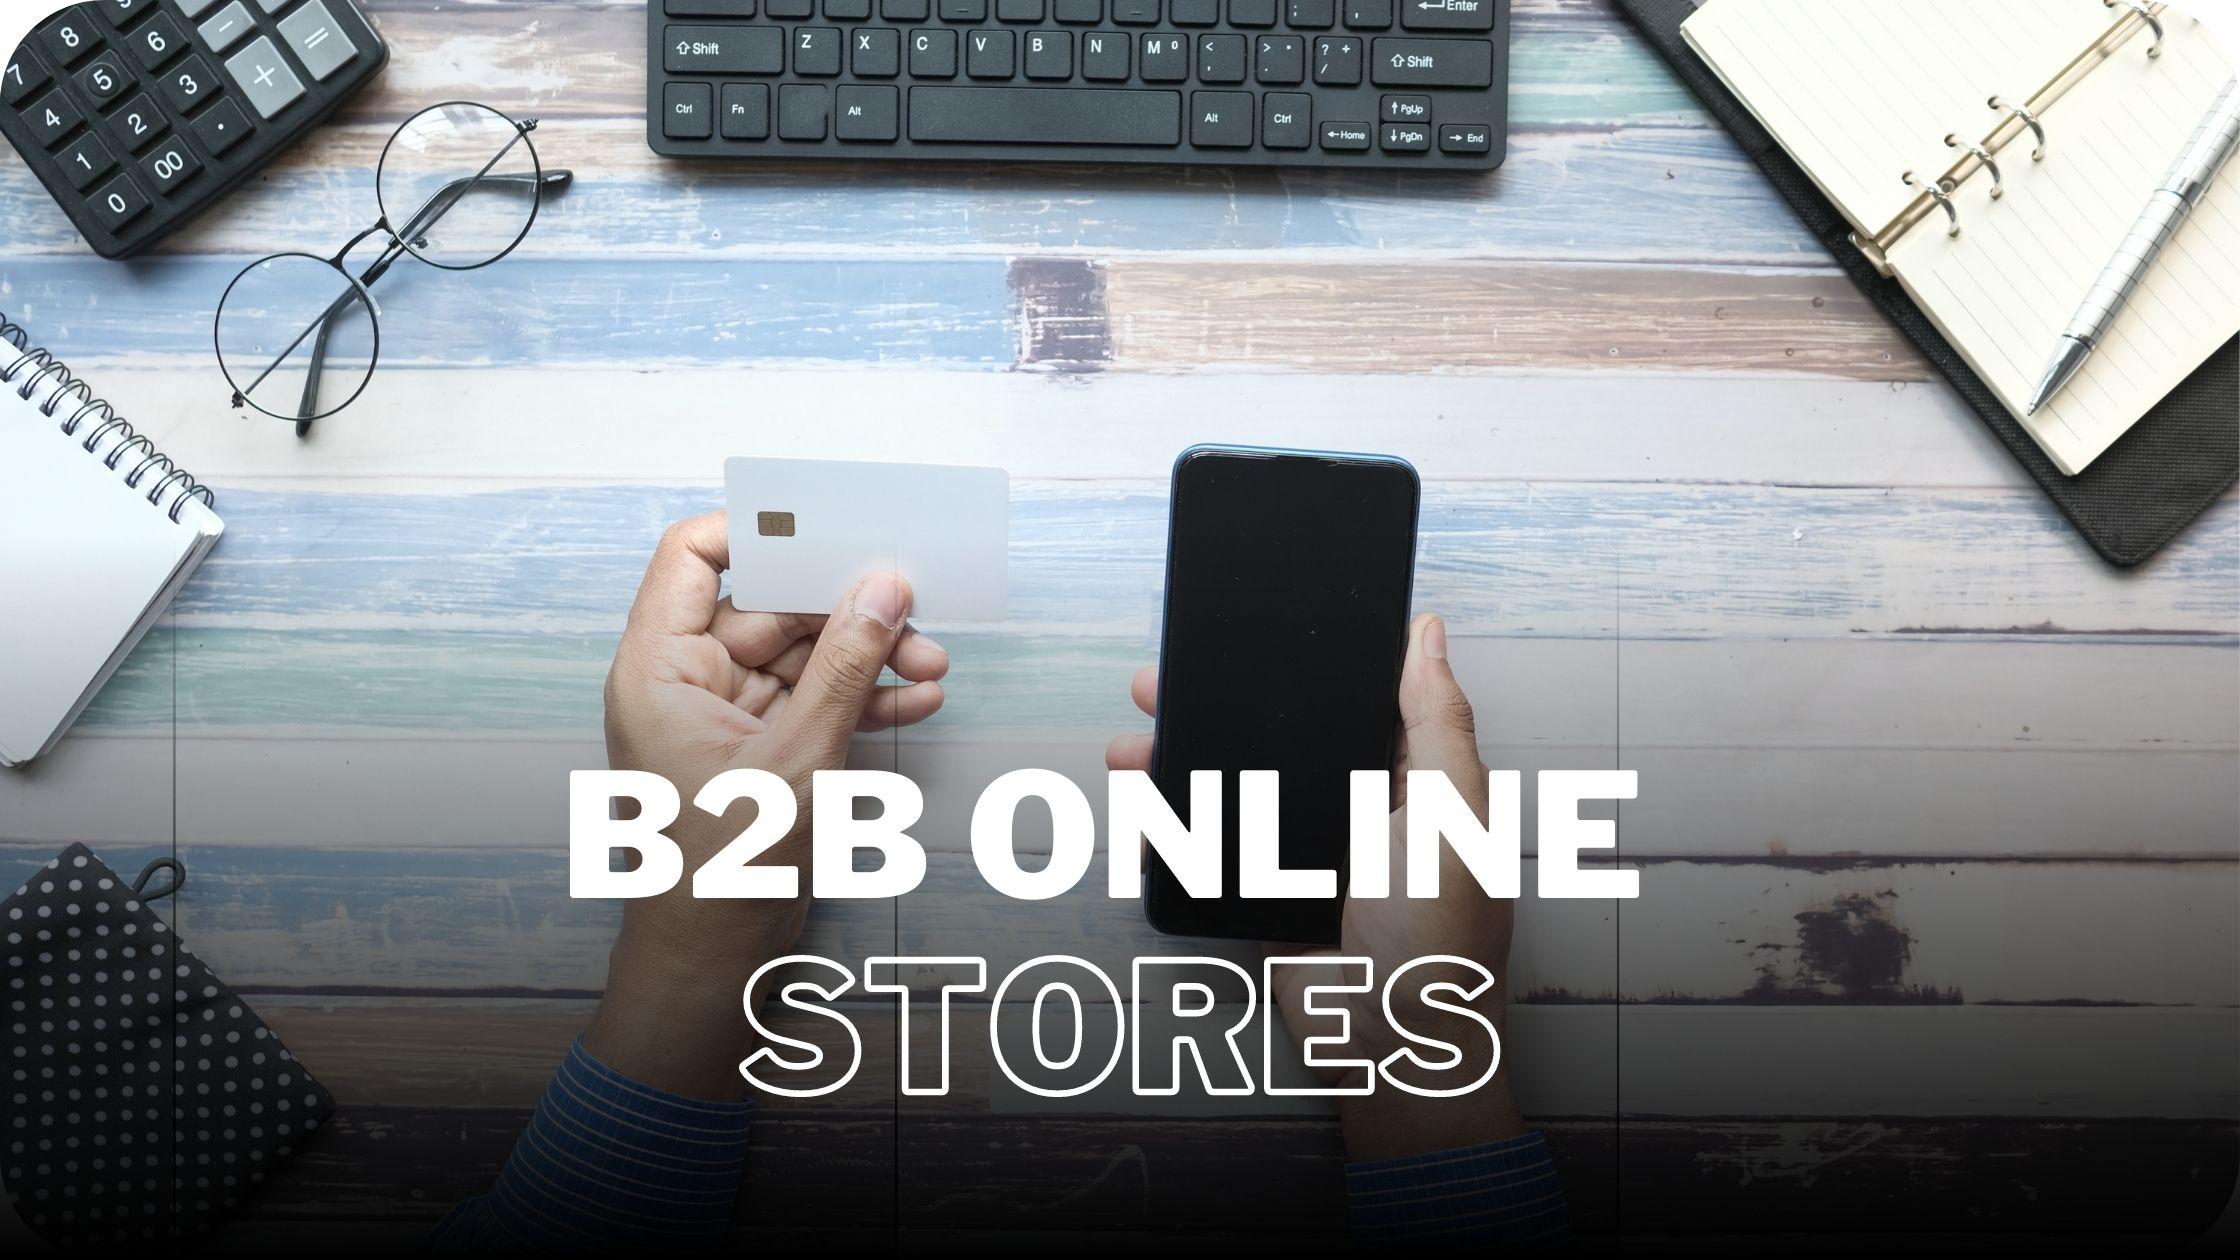 B2B Online Stores